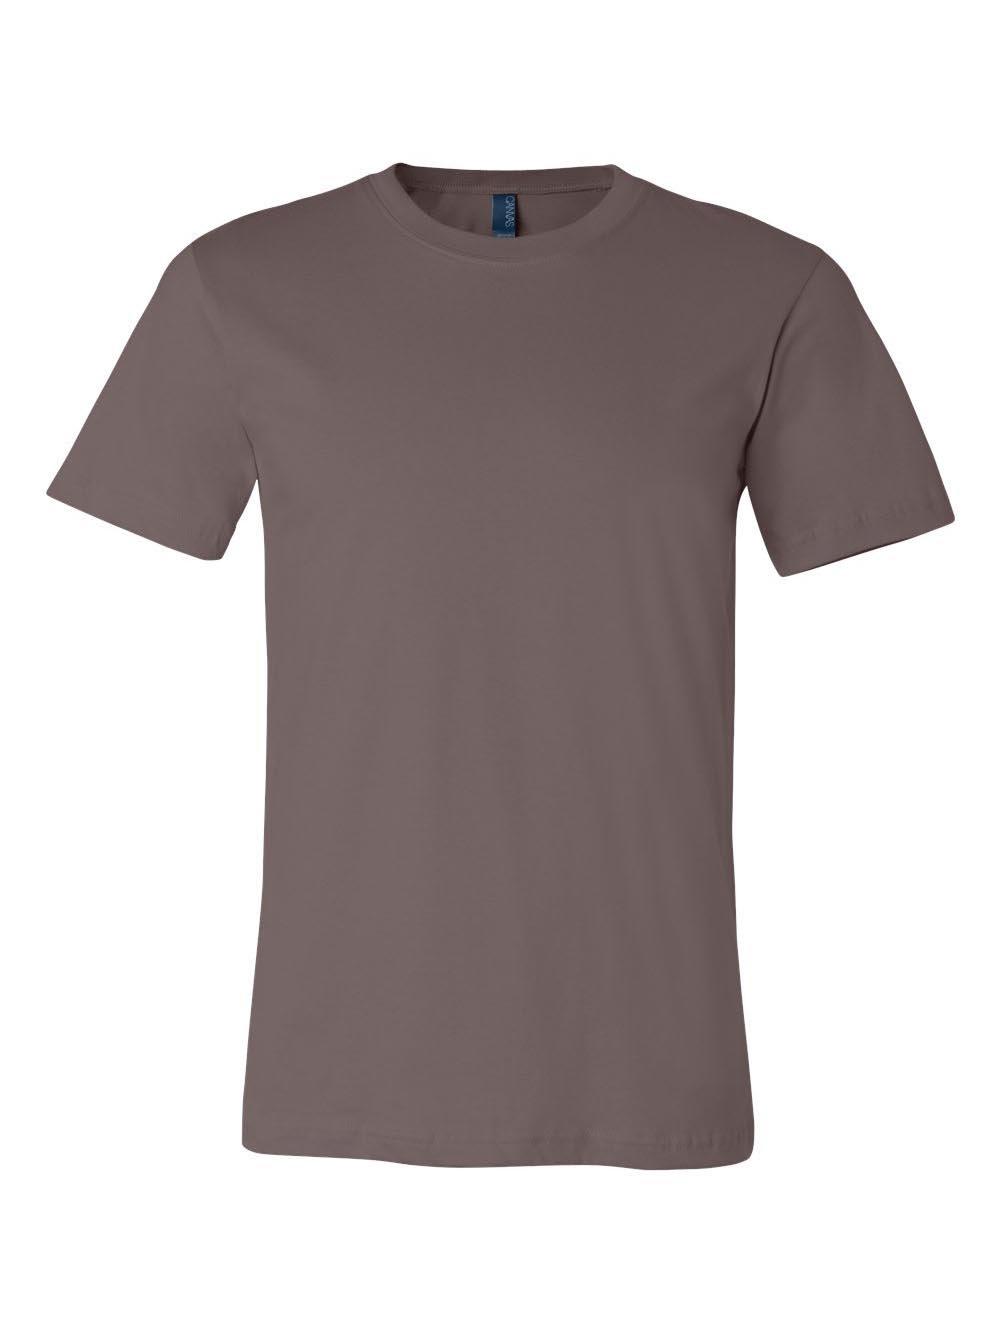 Bella 3001 Unisex Jersey Short Sleeve Tee - Pebble Brown, 3XL